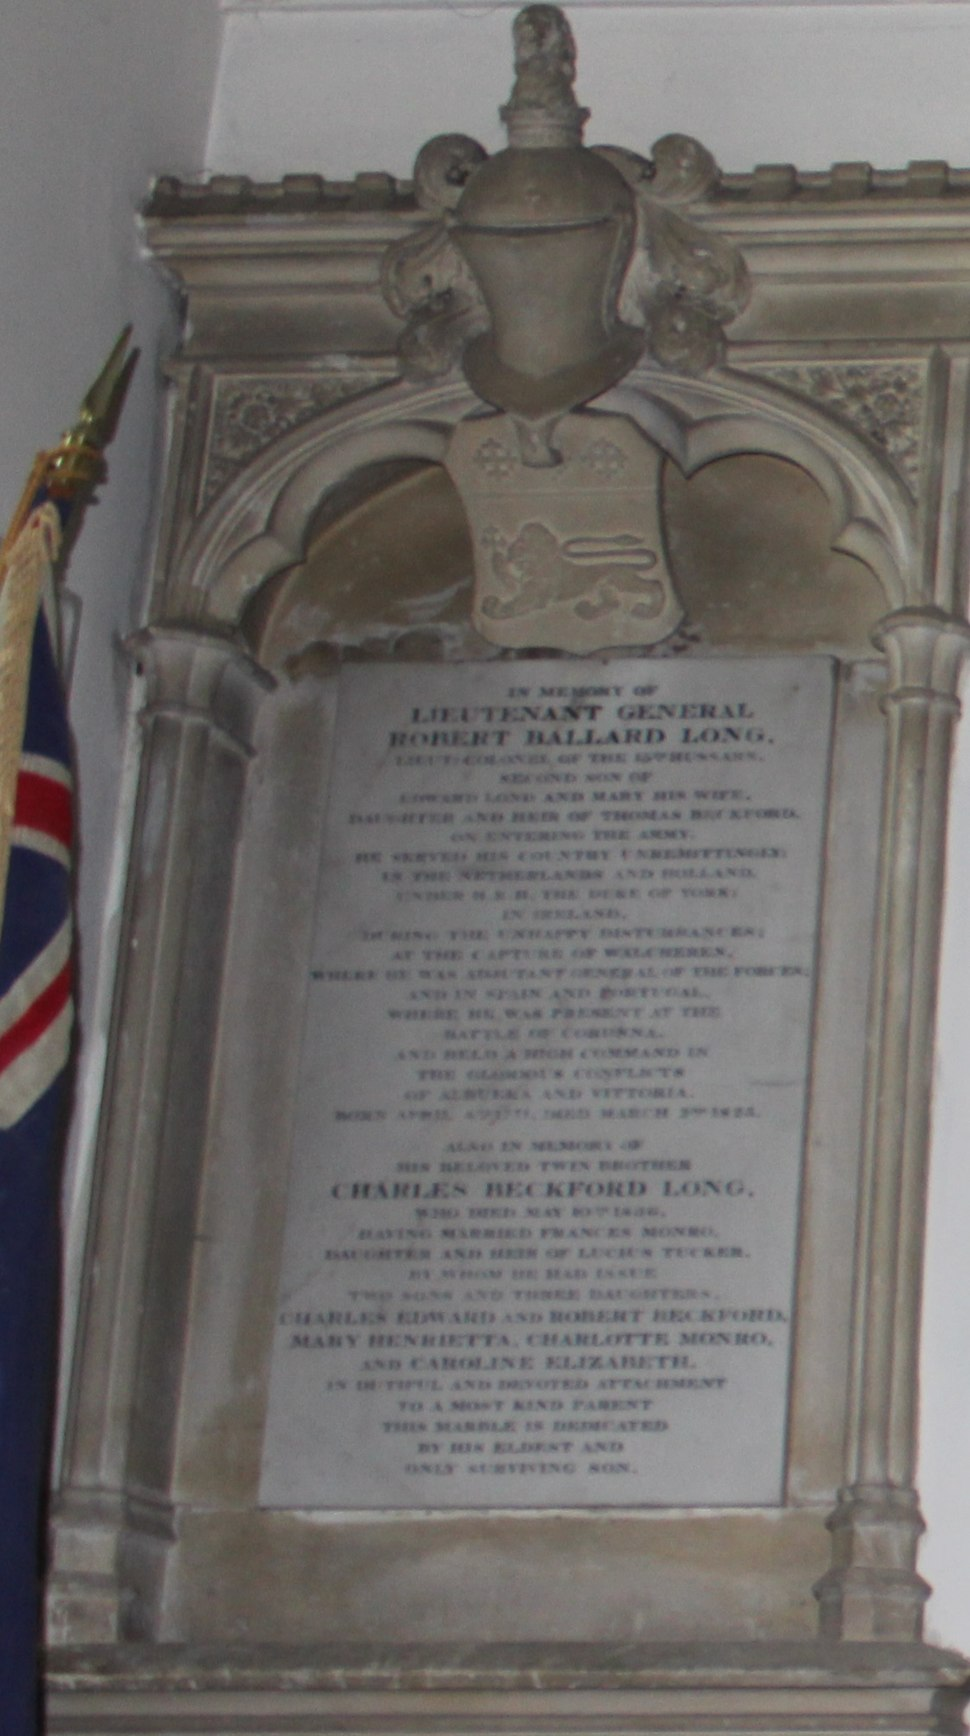 Robert Ballard Long memorial